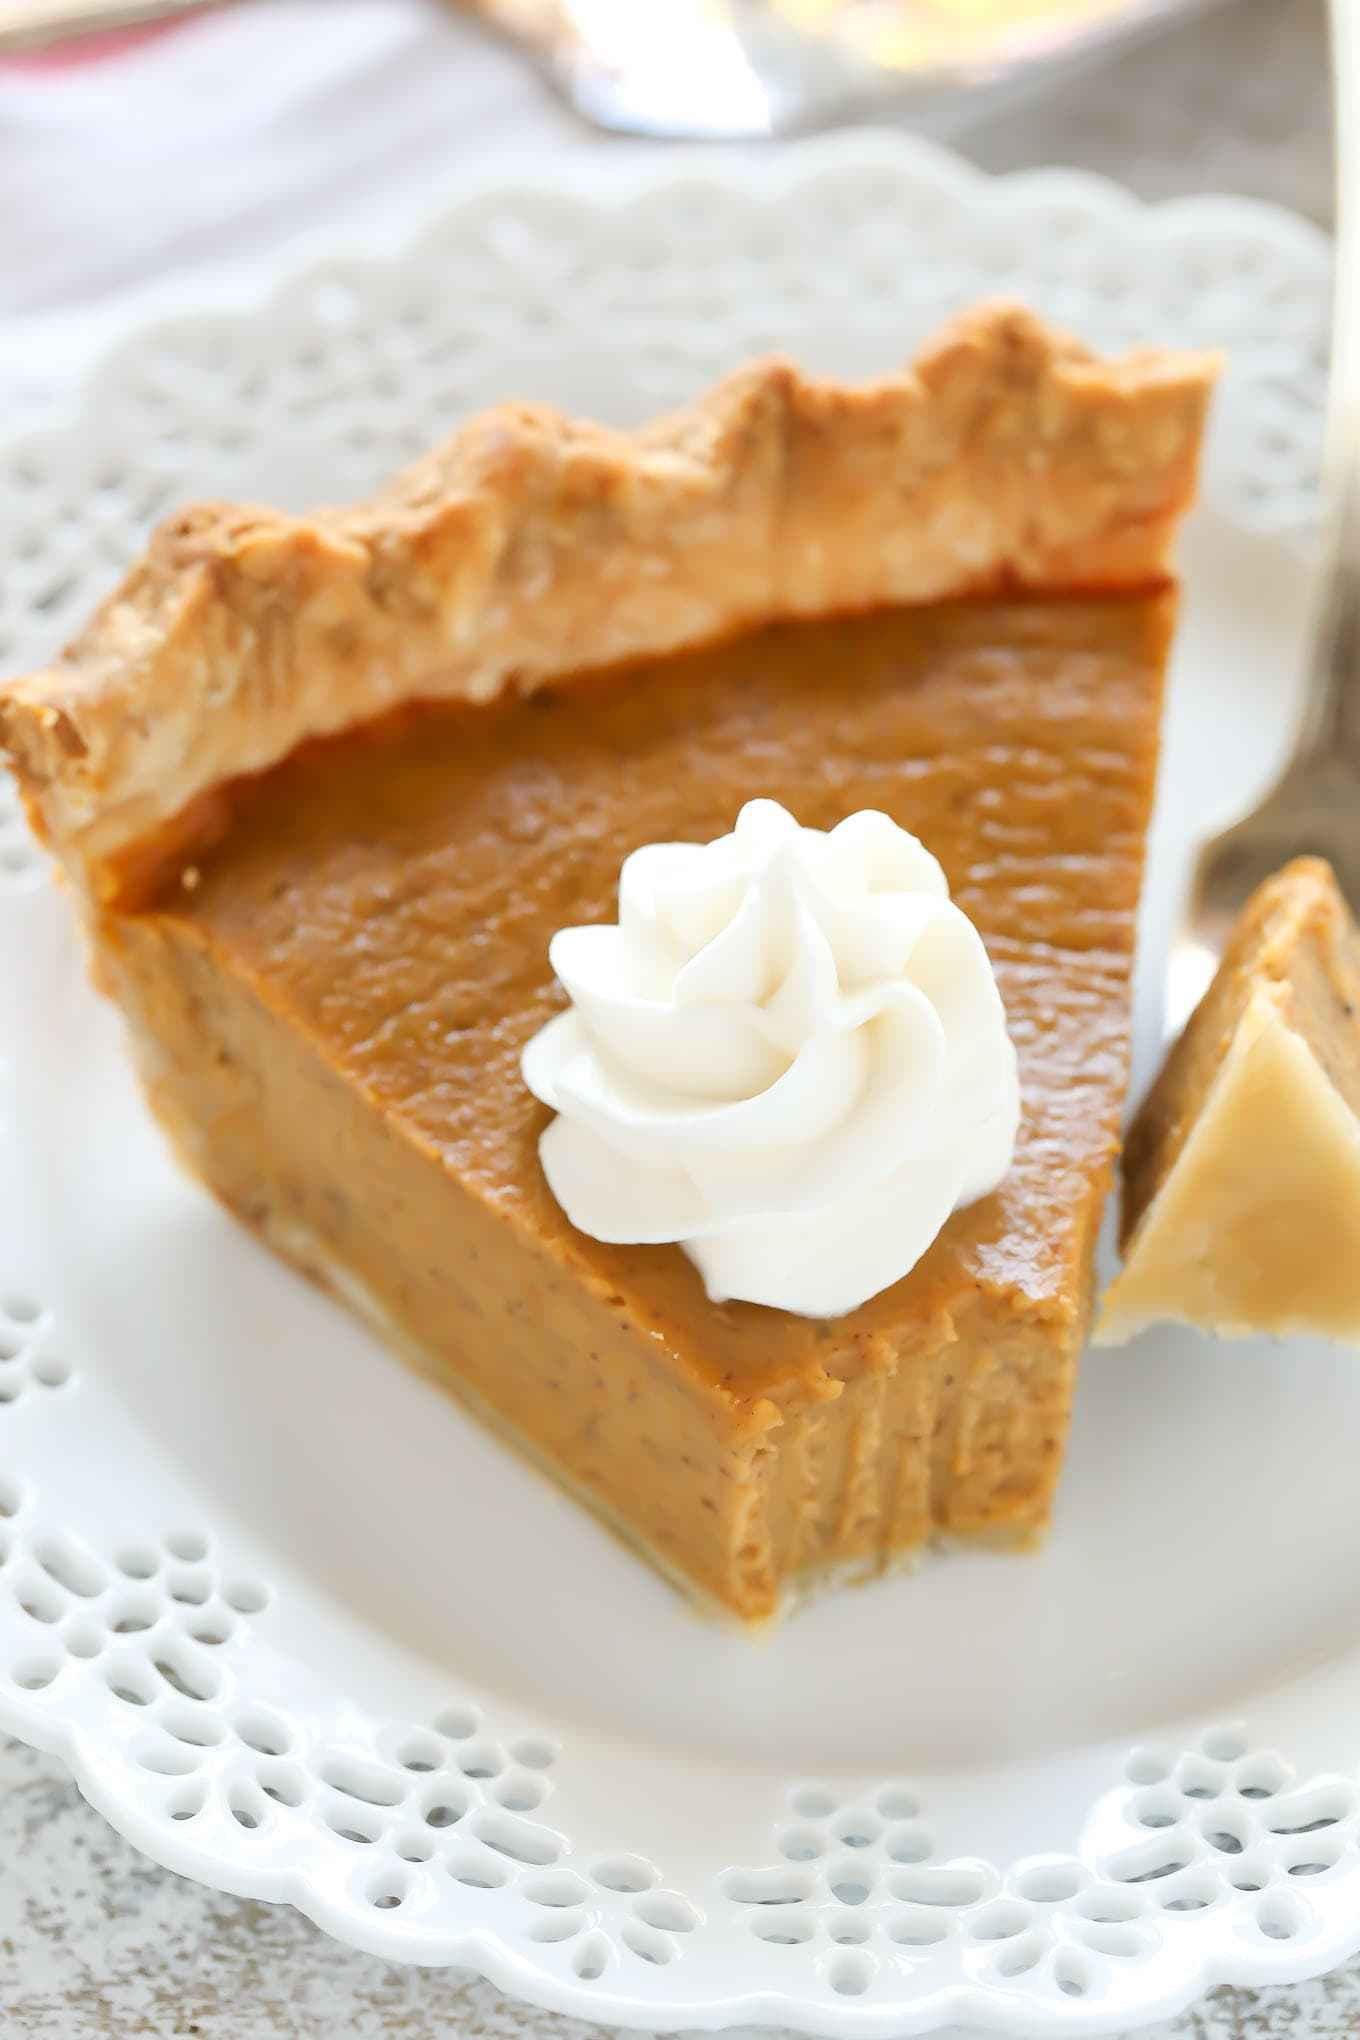 Costco Pies Thanksgiving  Pumpkin Pie Recipe